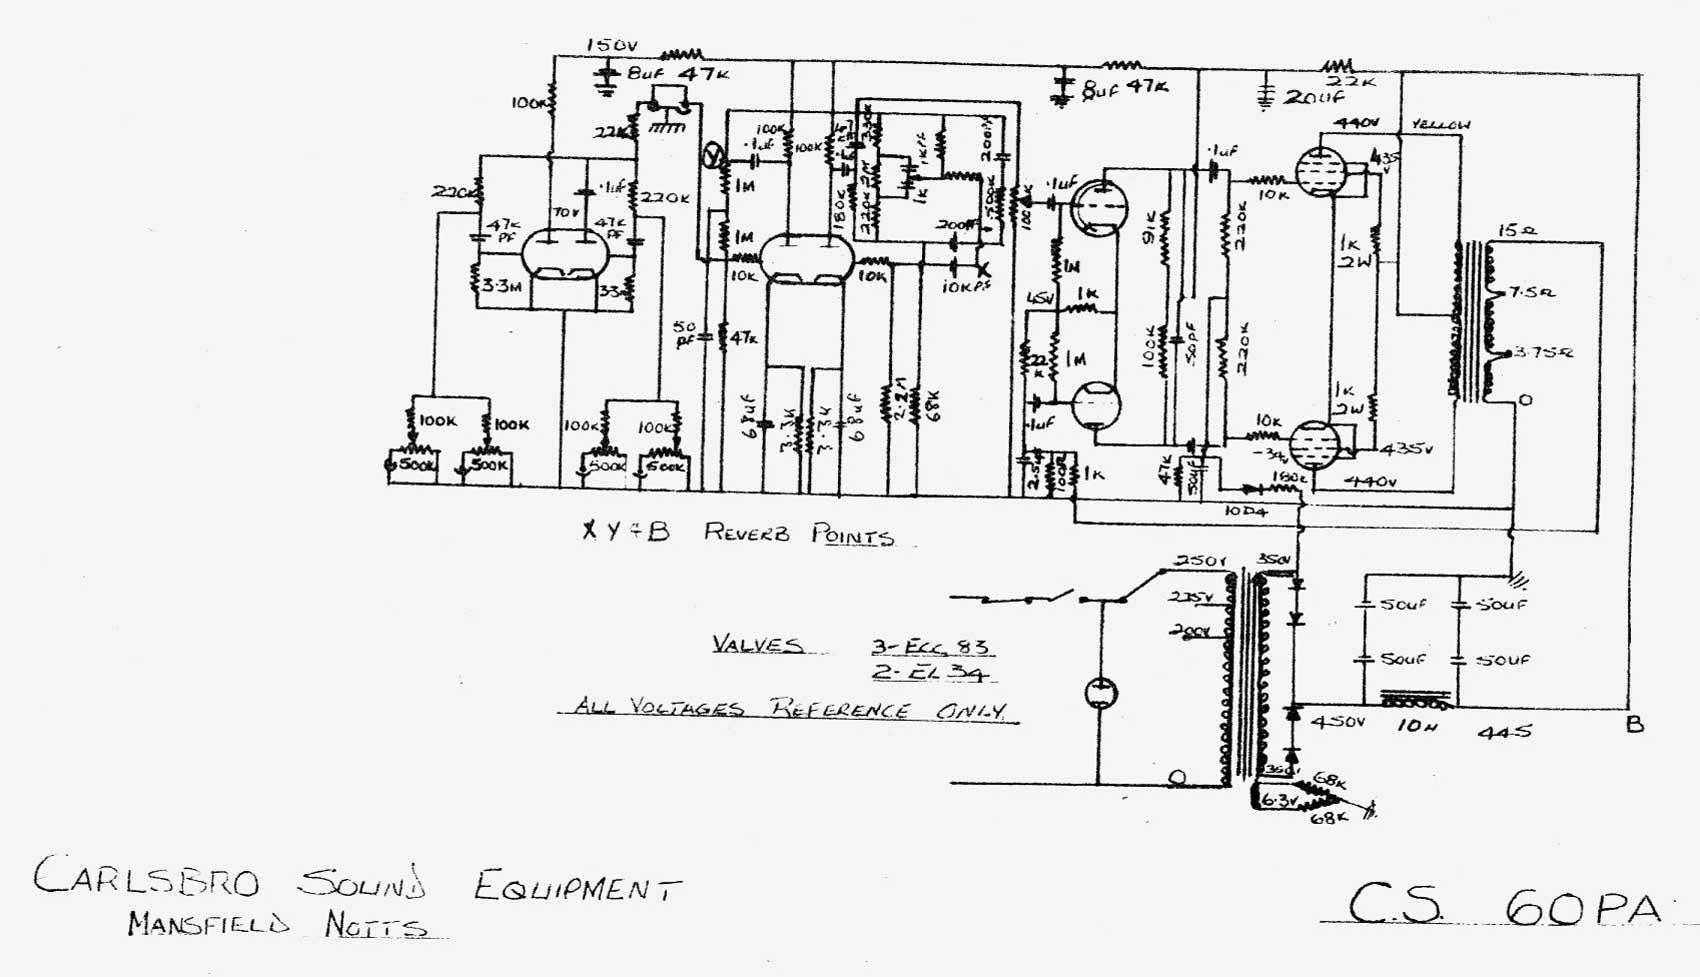 Carlsbro Cs60 P A Amp Schematic